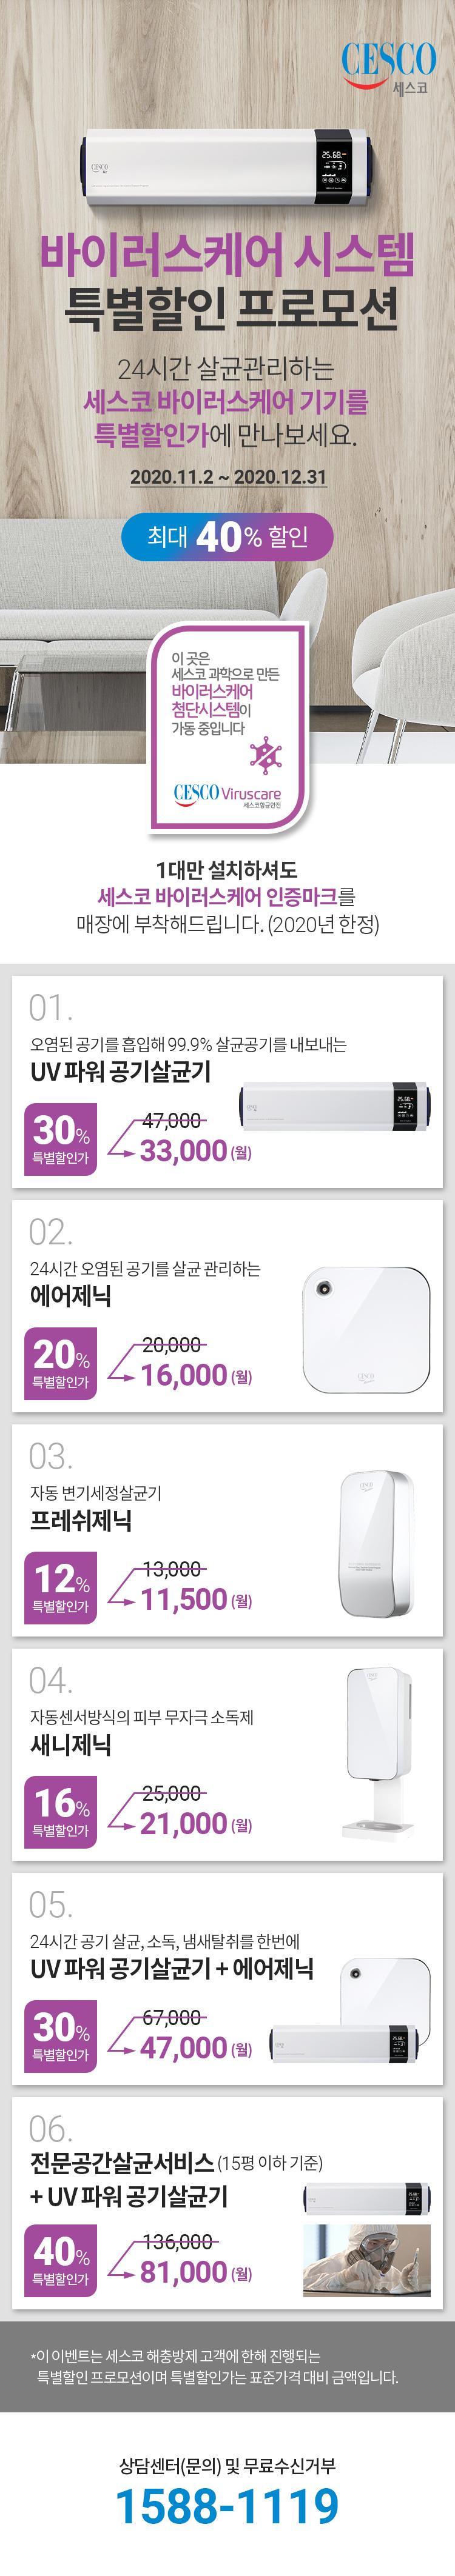 201102_VCS 복합상품 유도 프로모션.jpg